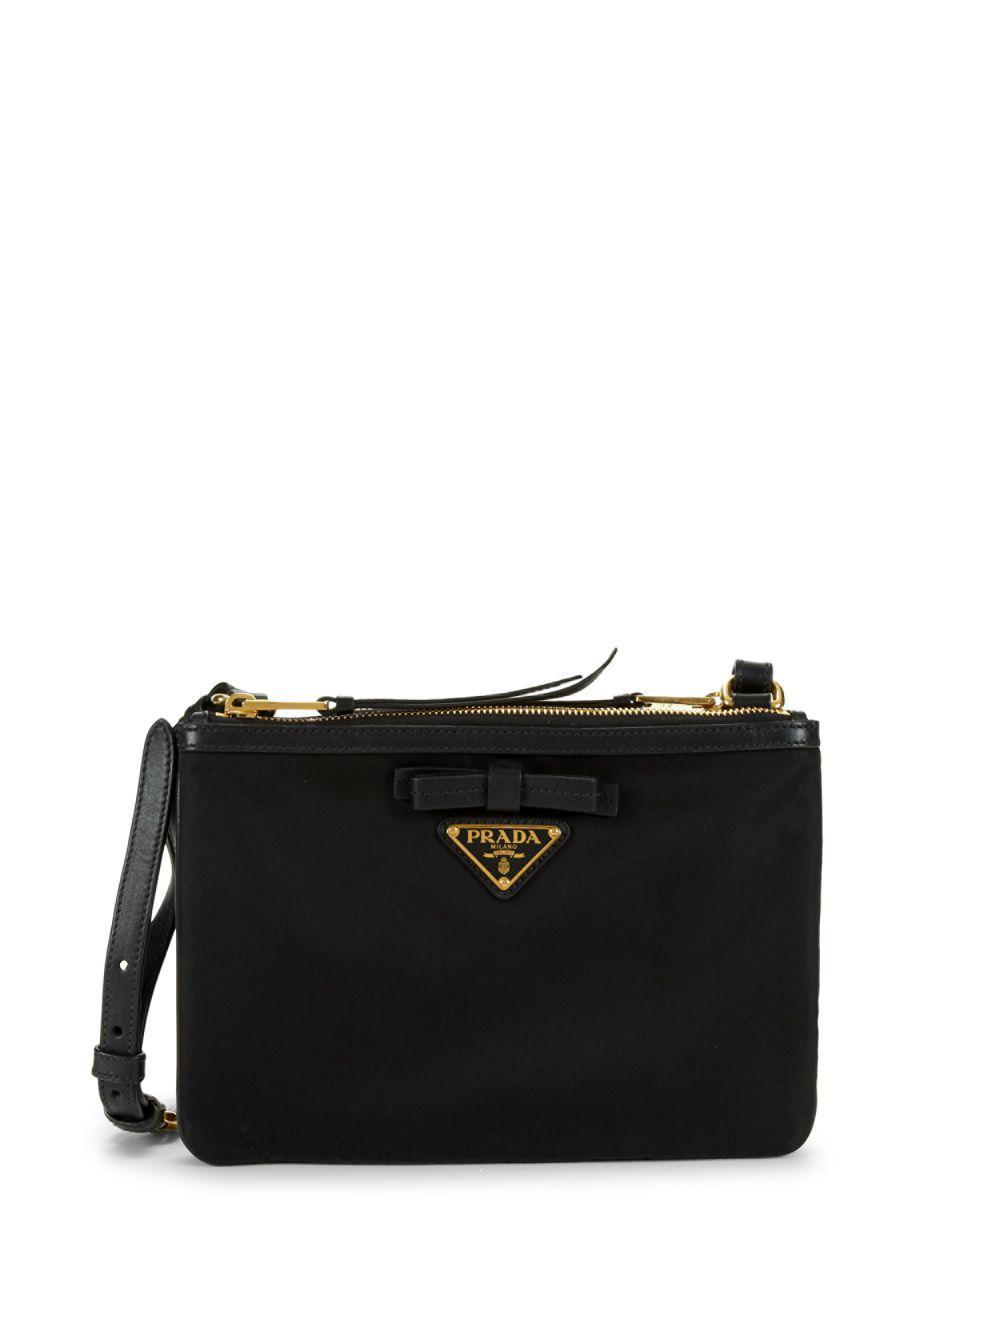 715c2dabd190e1 Prada Bow Logo Plaque Crossbody Bag in Black - Lyst